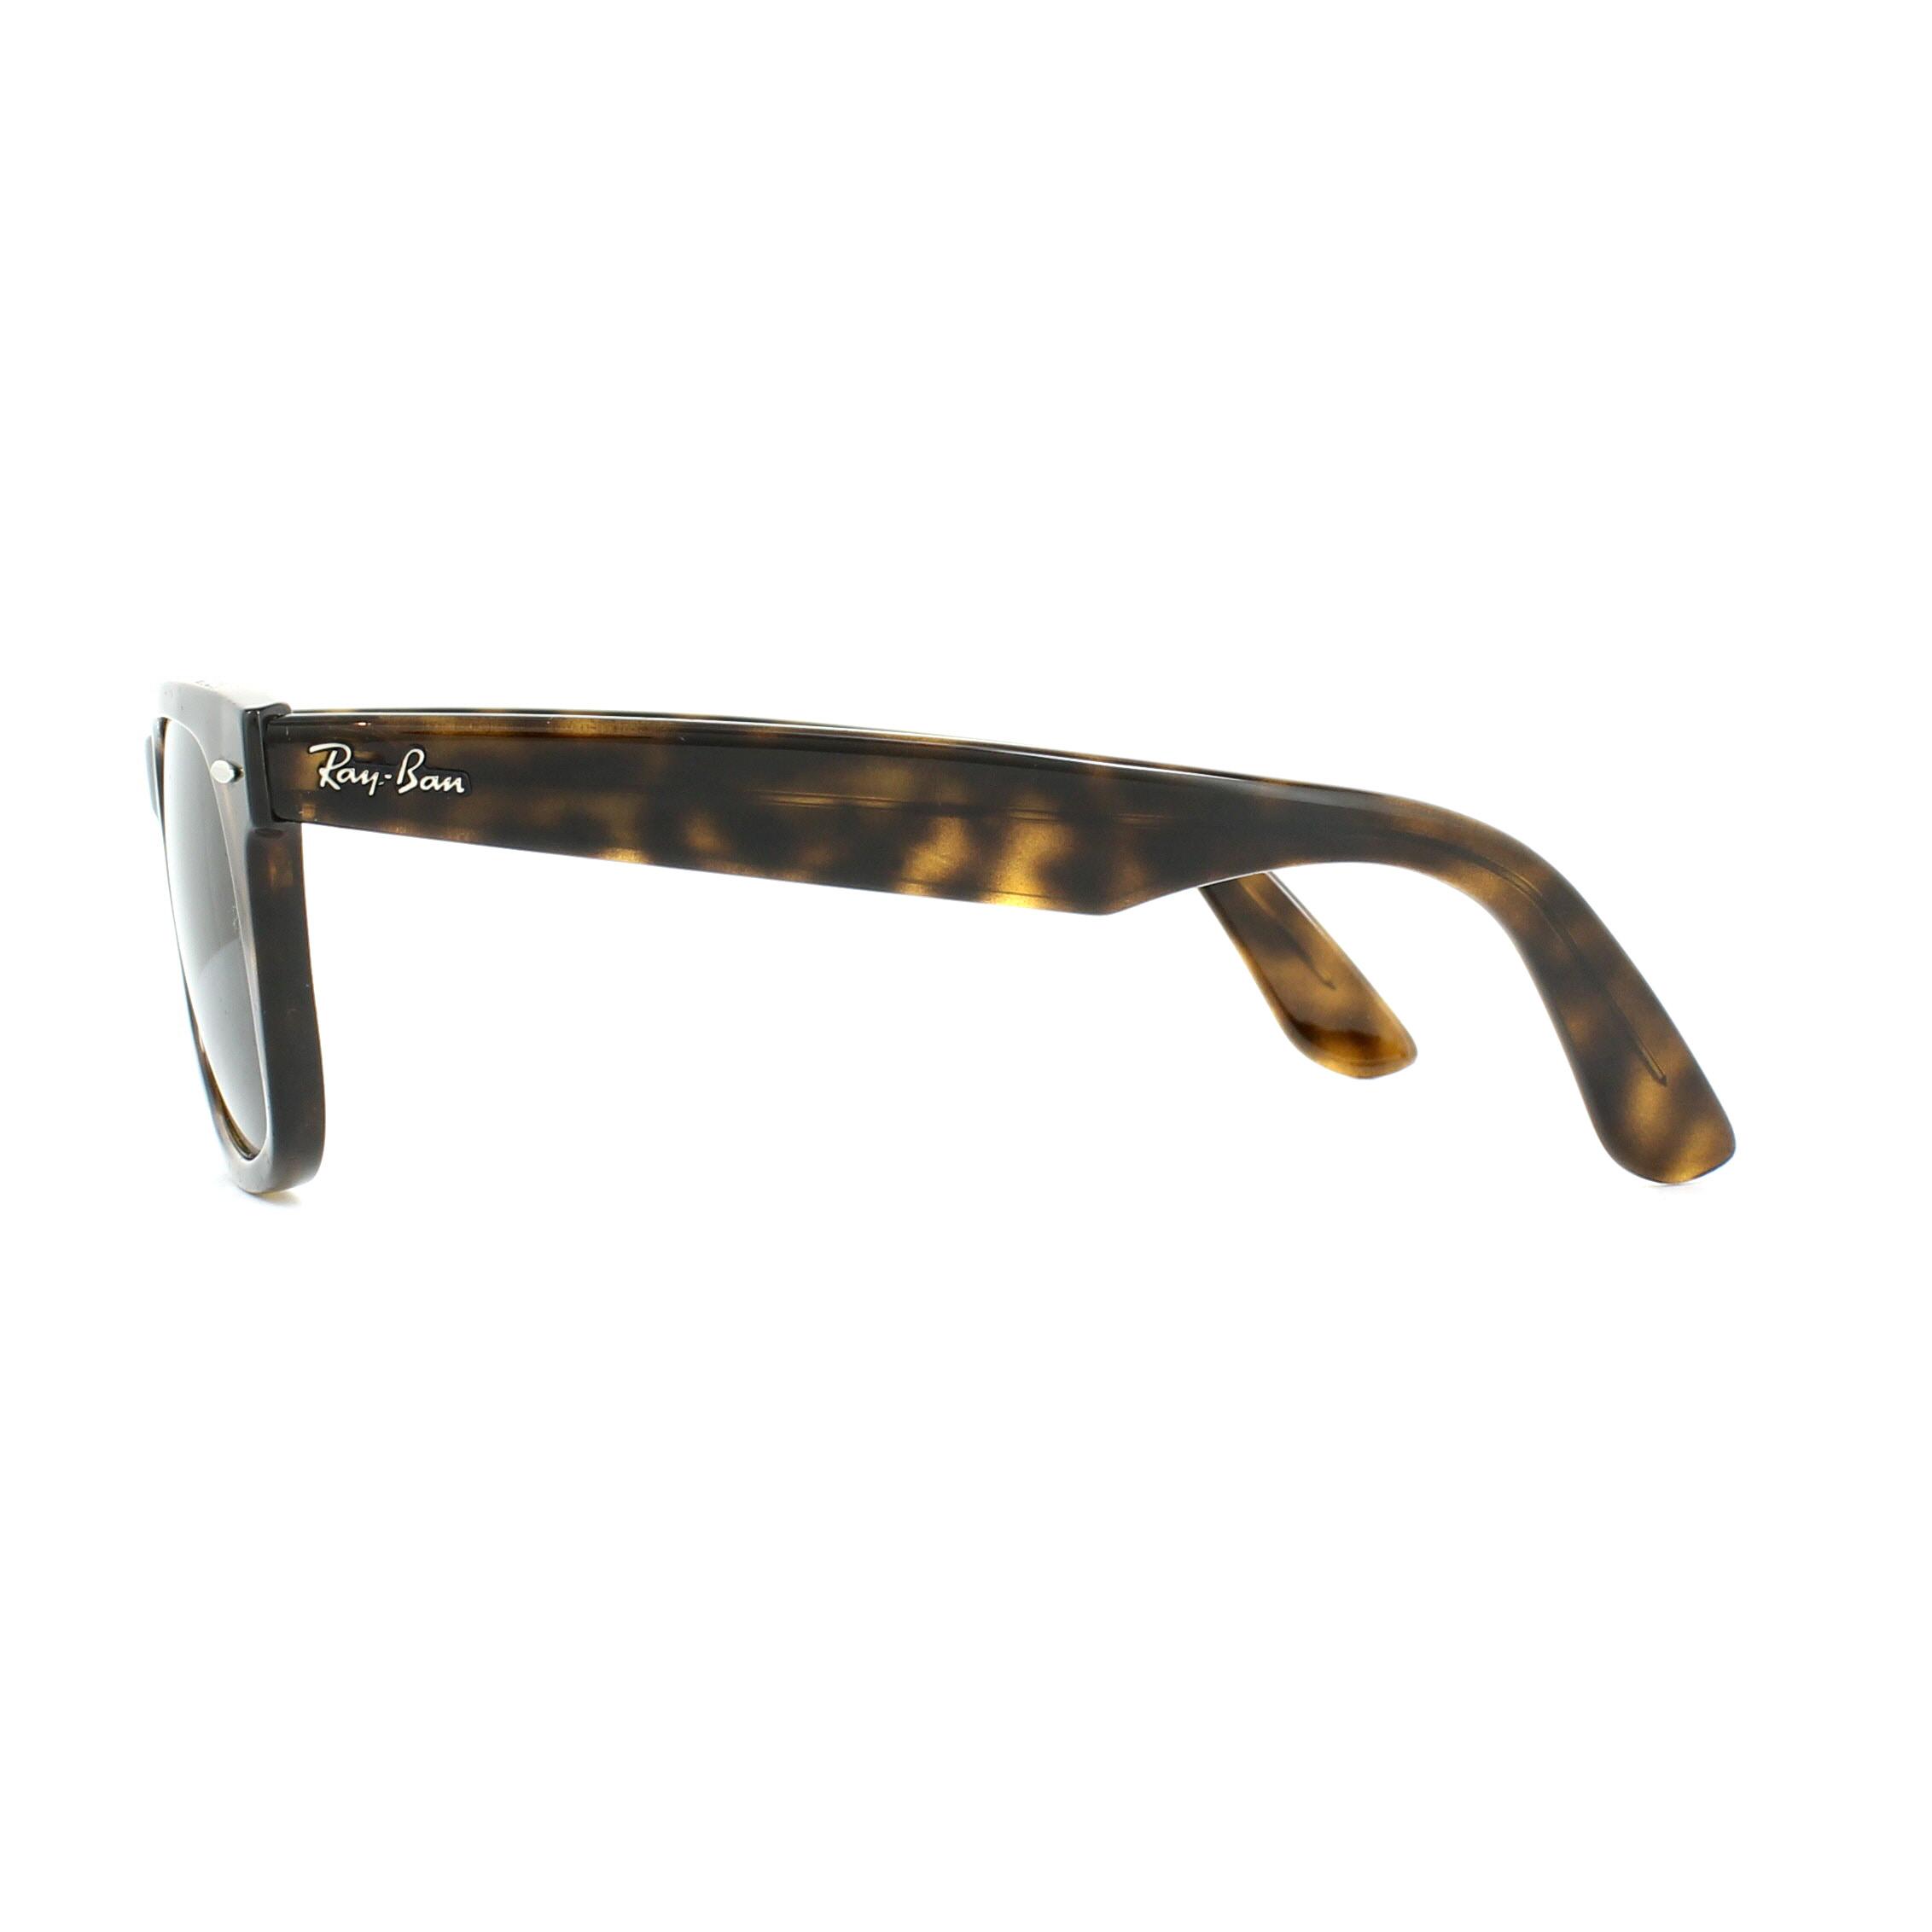 9fff50f658244 SENTINEL Ray-Ban occhiali da sole Wayfarer facilità RB4340 710 tartaruga  verde G-15